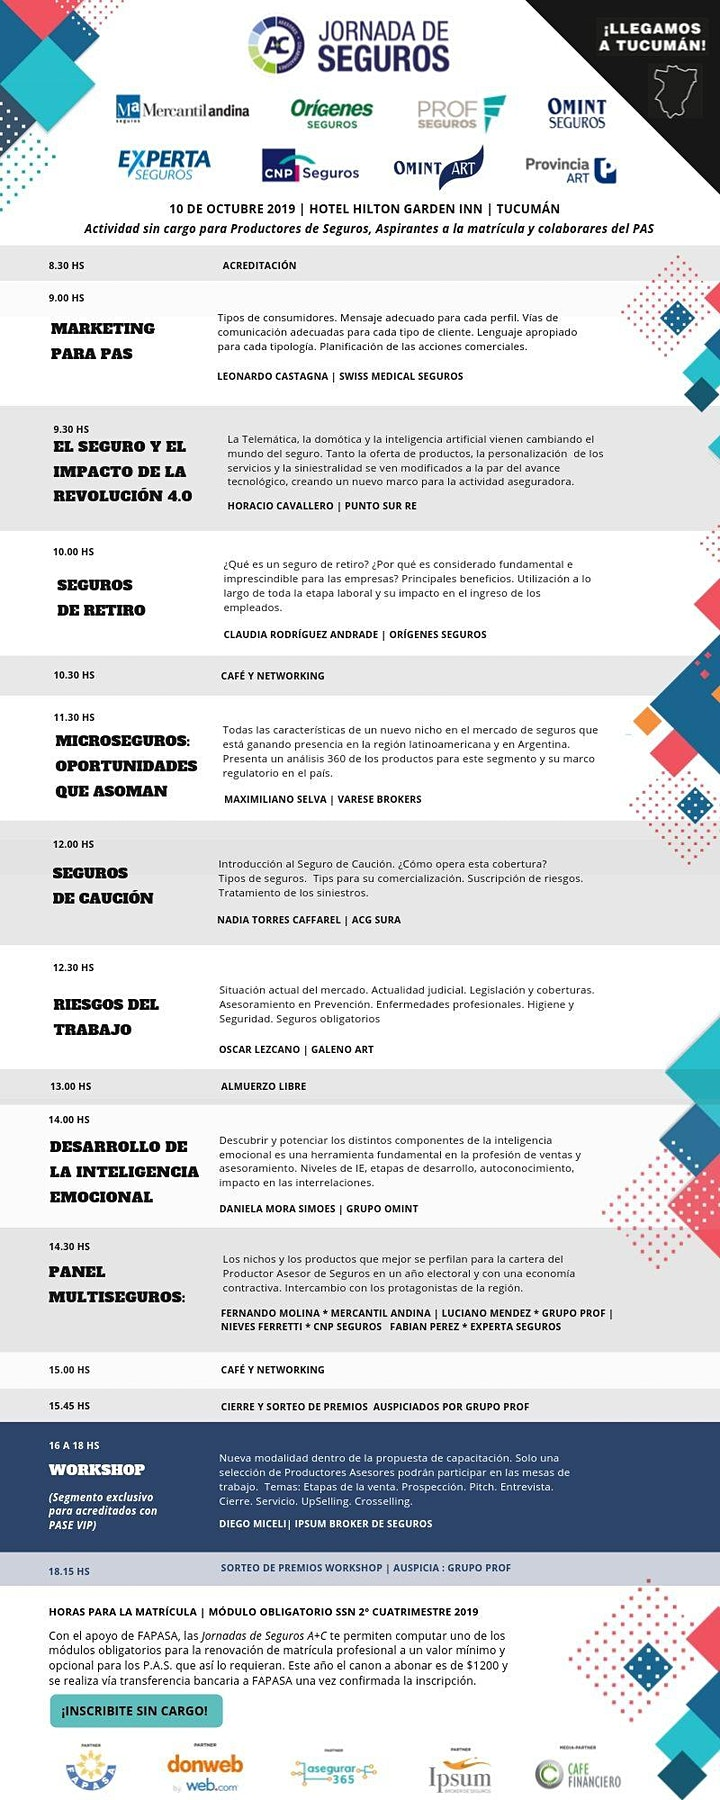 Imagen de Jornada de Seguros A+C Tucumán 2019